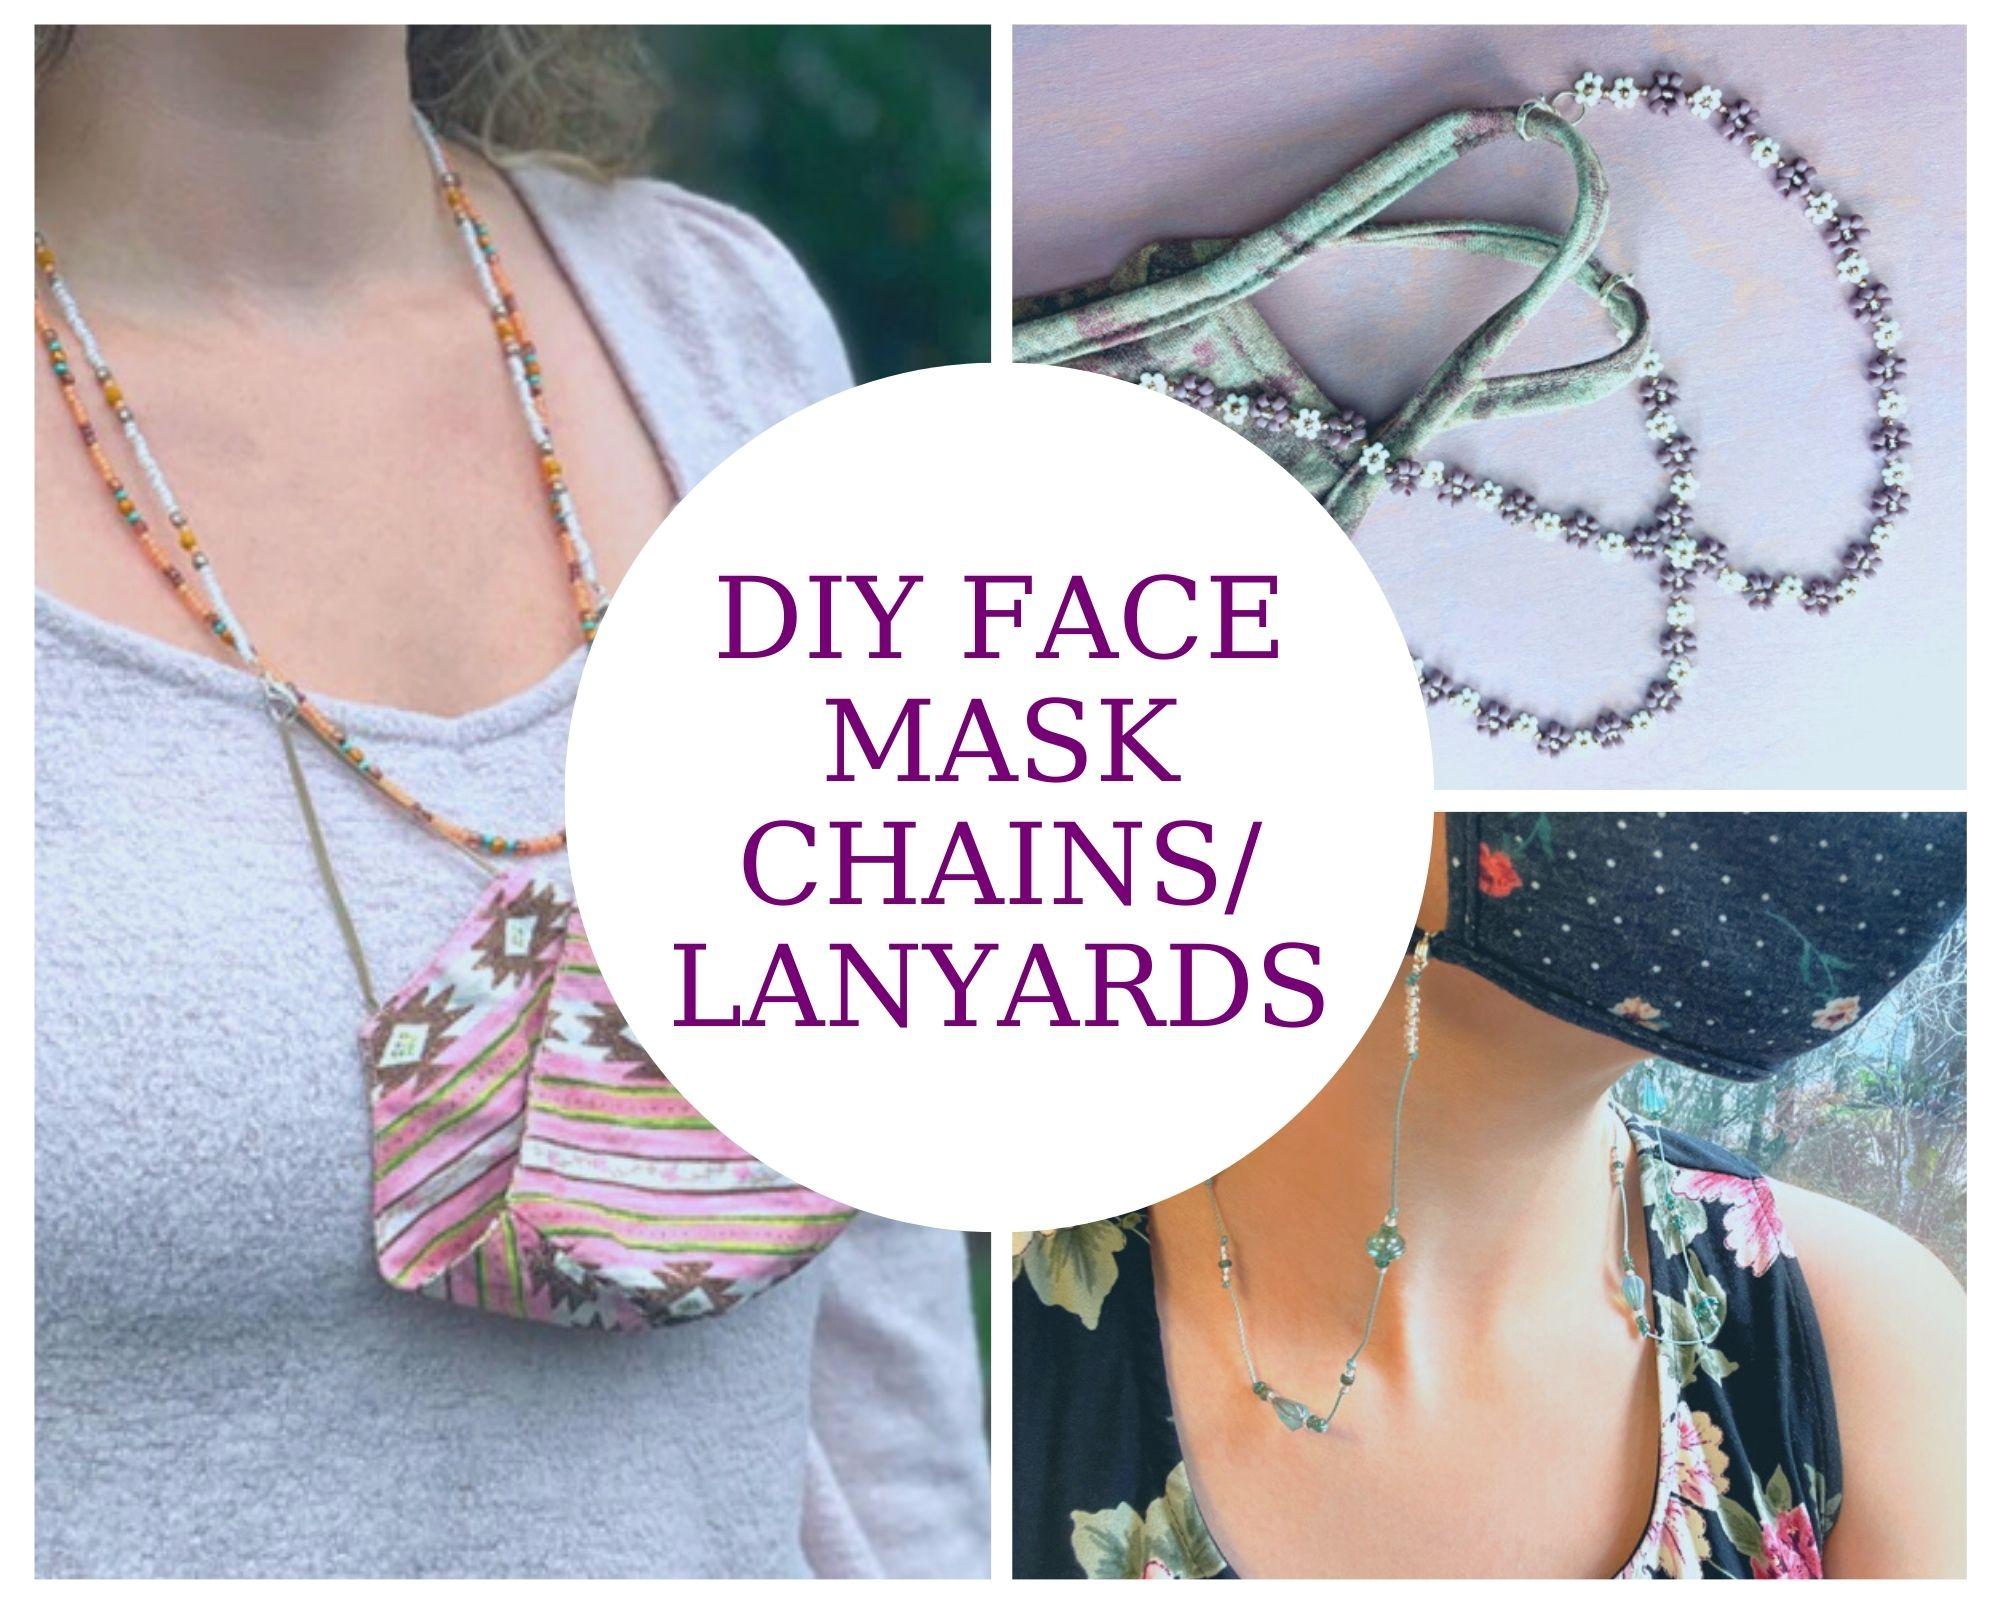 DIY Face Mask Chains/Lanyards